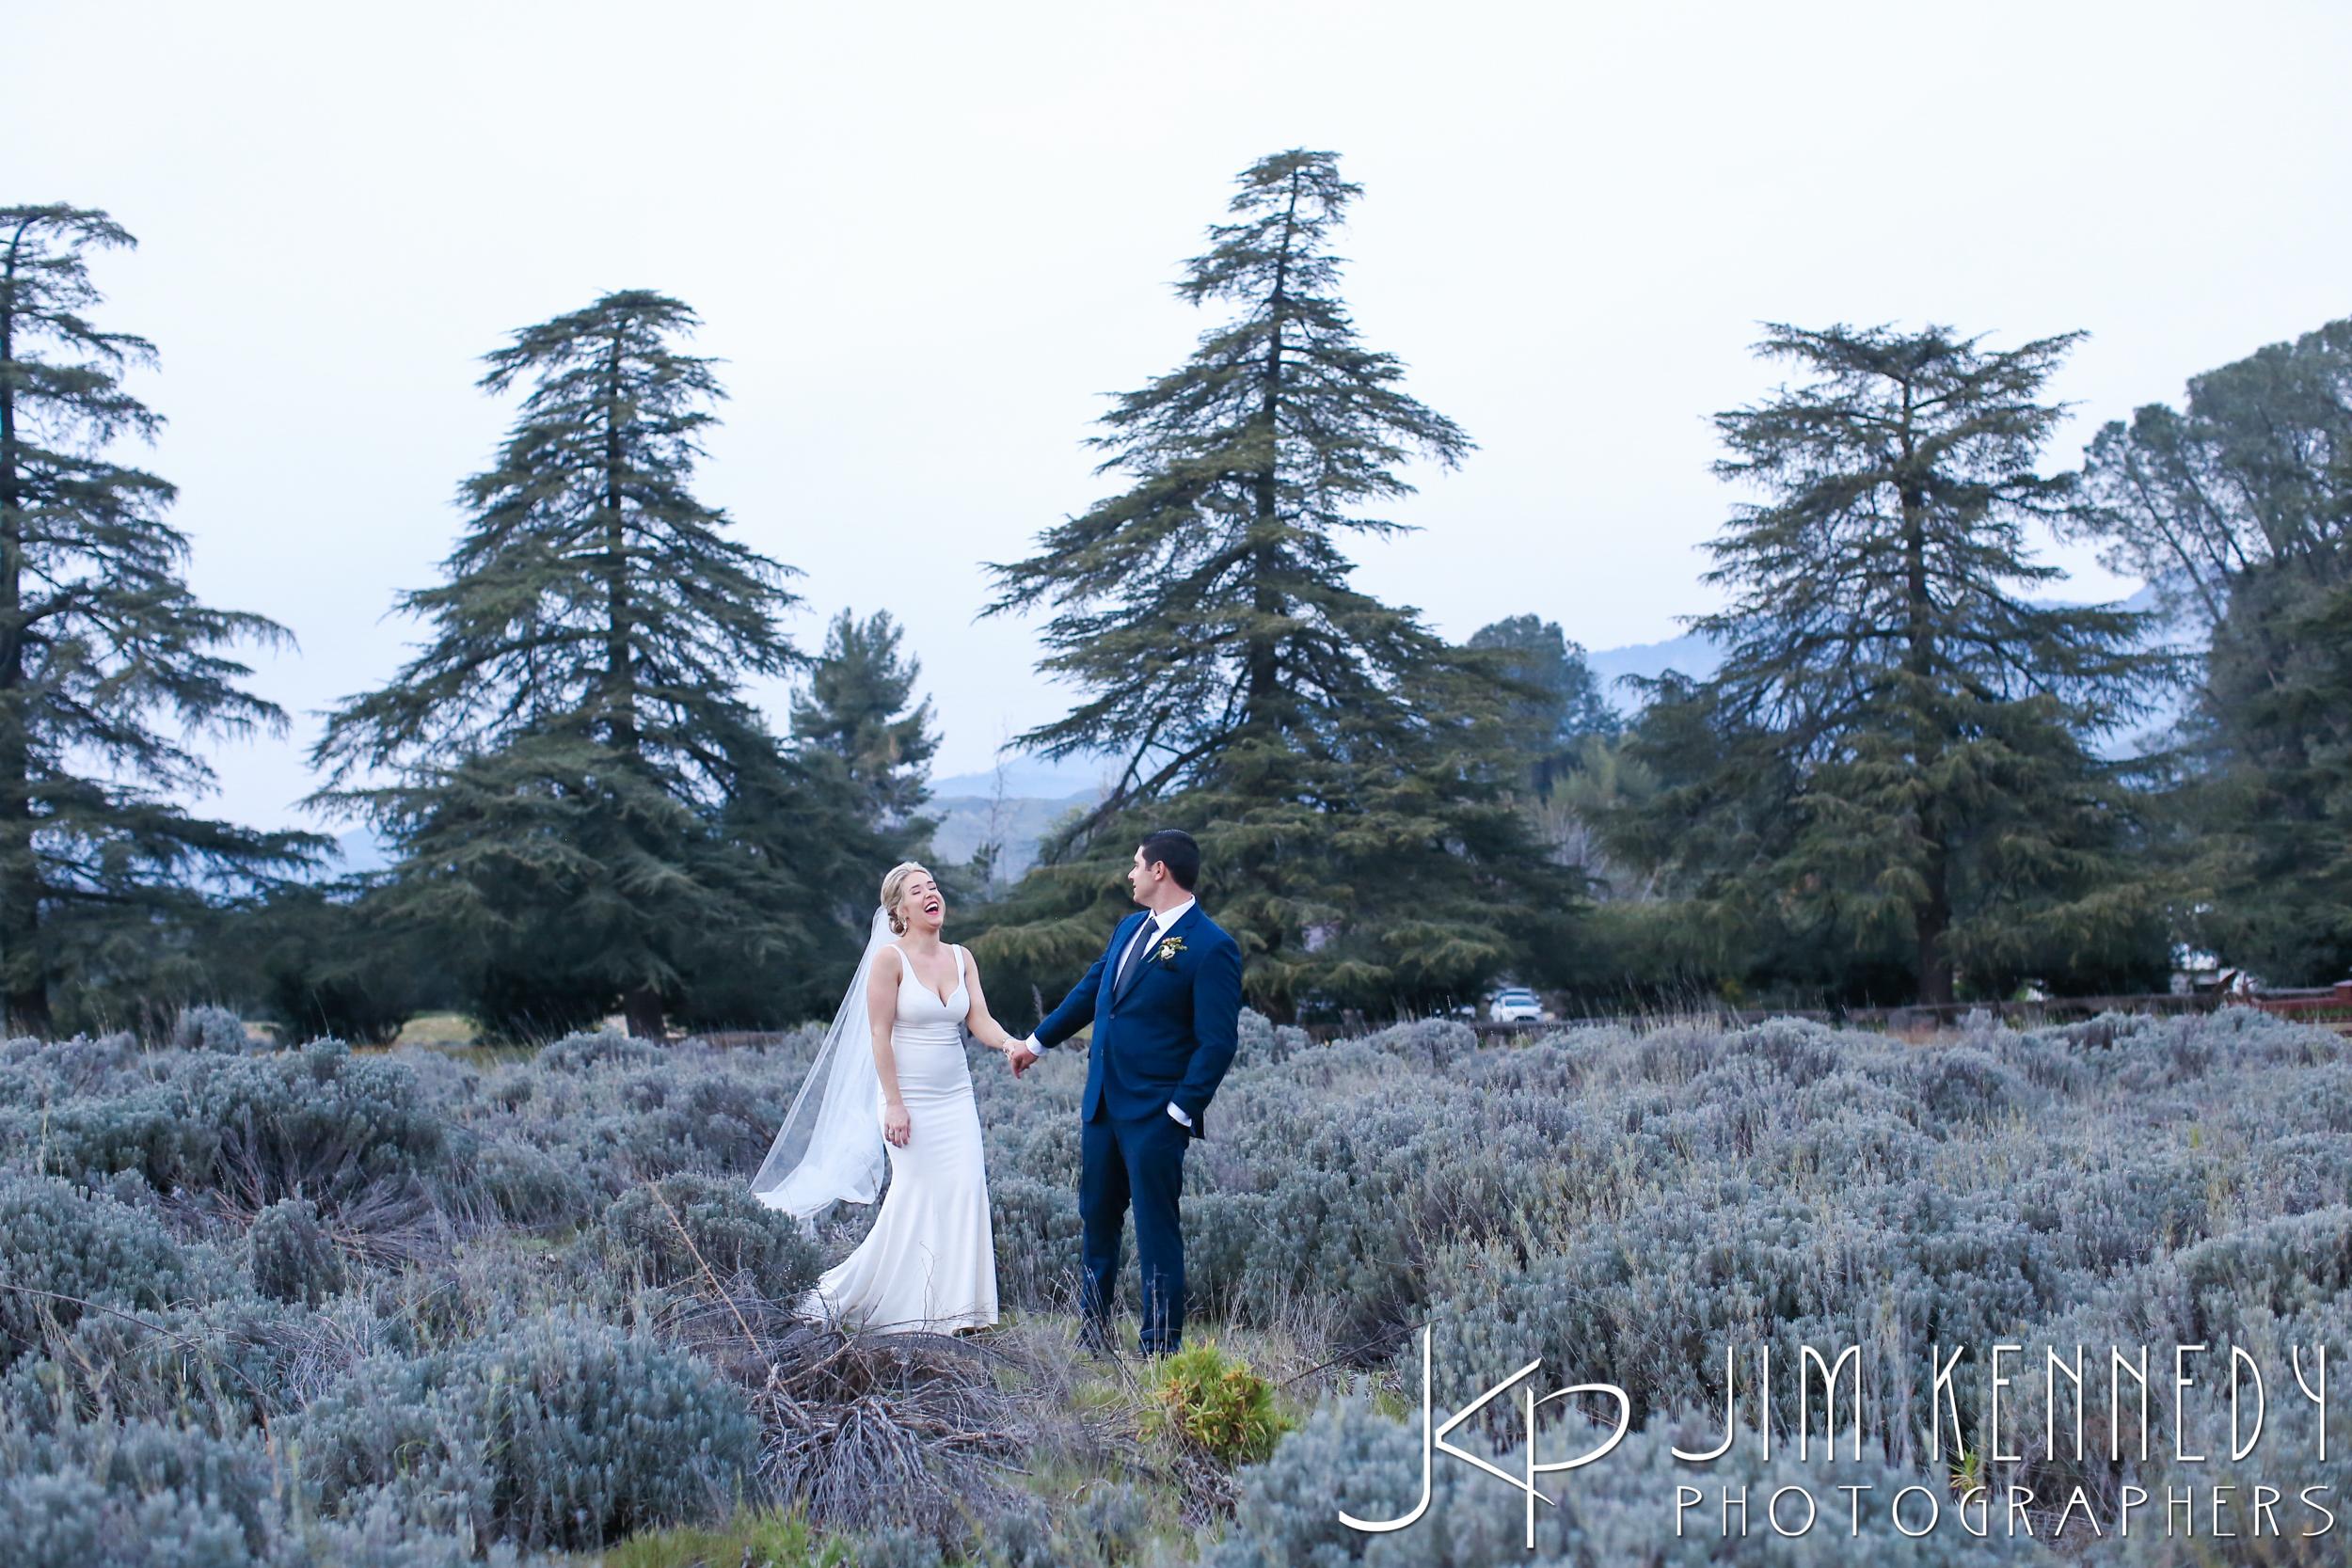 jim_kennedy_photographers_highland_springs_wedding_caitlyn_0158.jpg